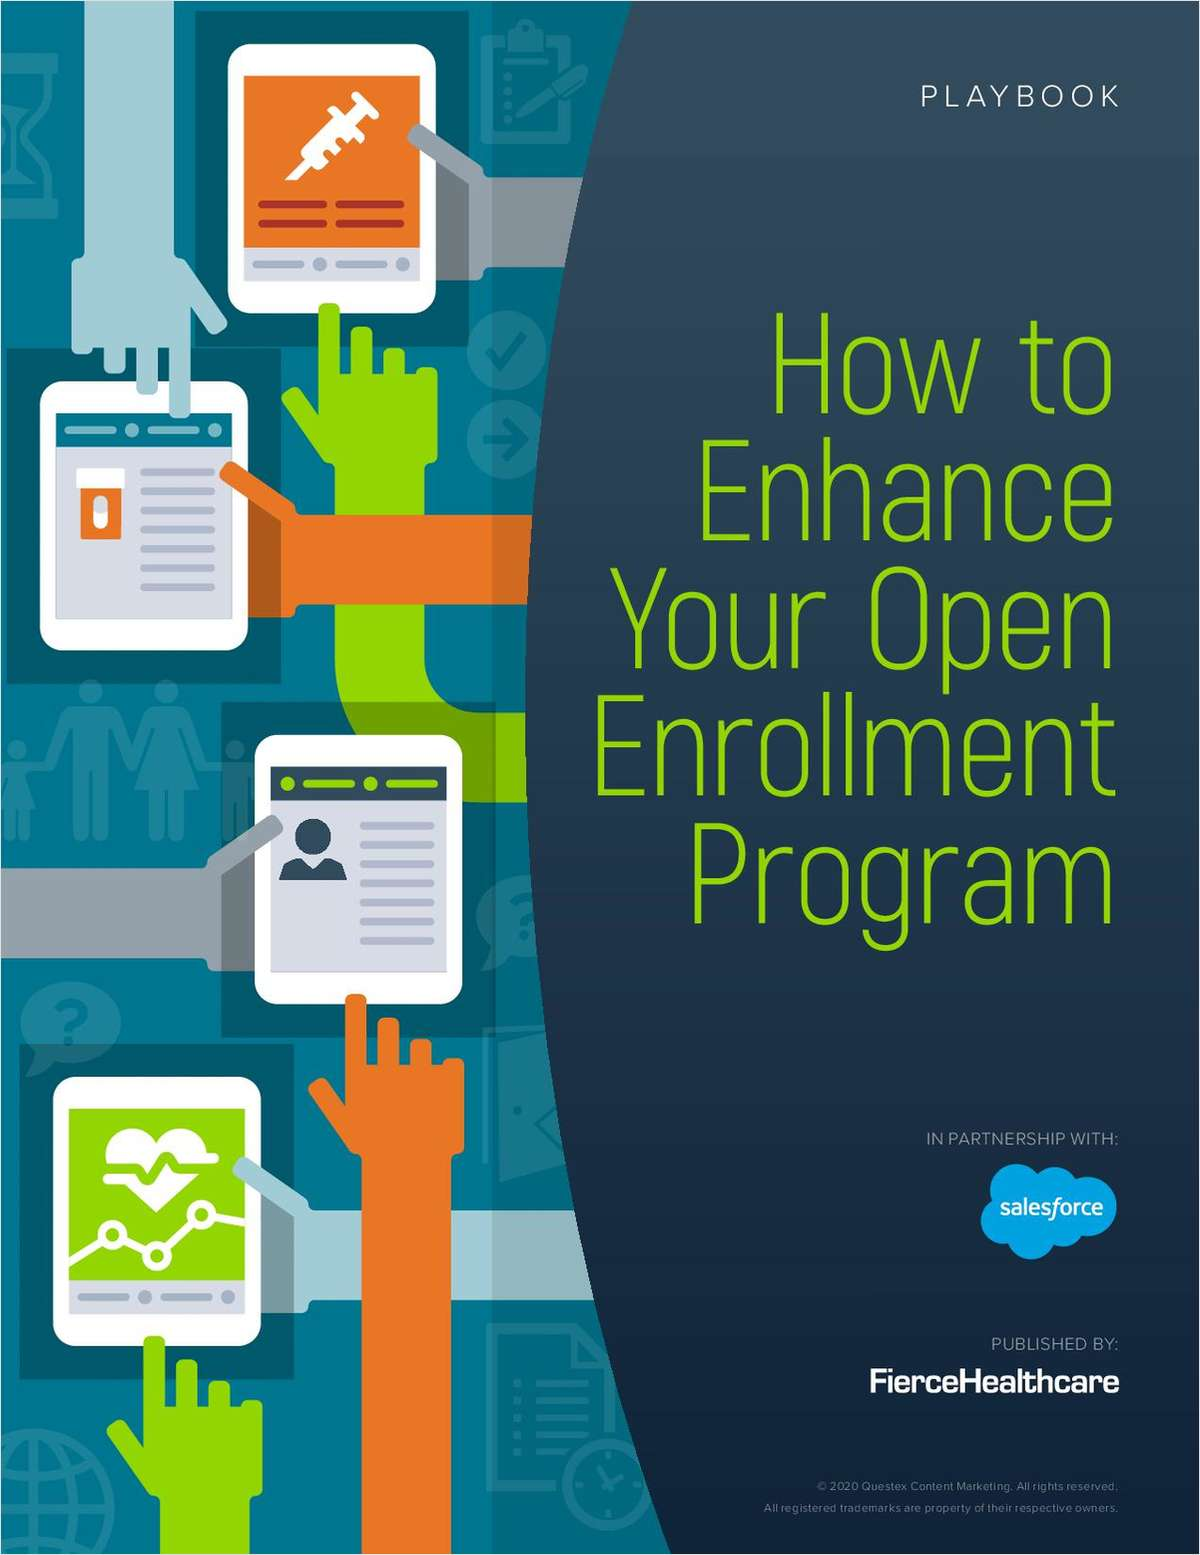 How to Enhance Your Open Enrollment Program